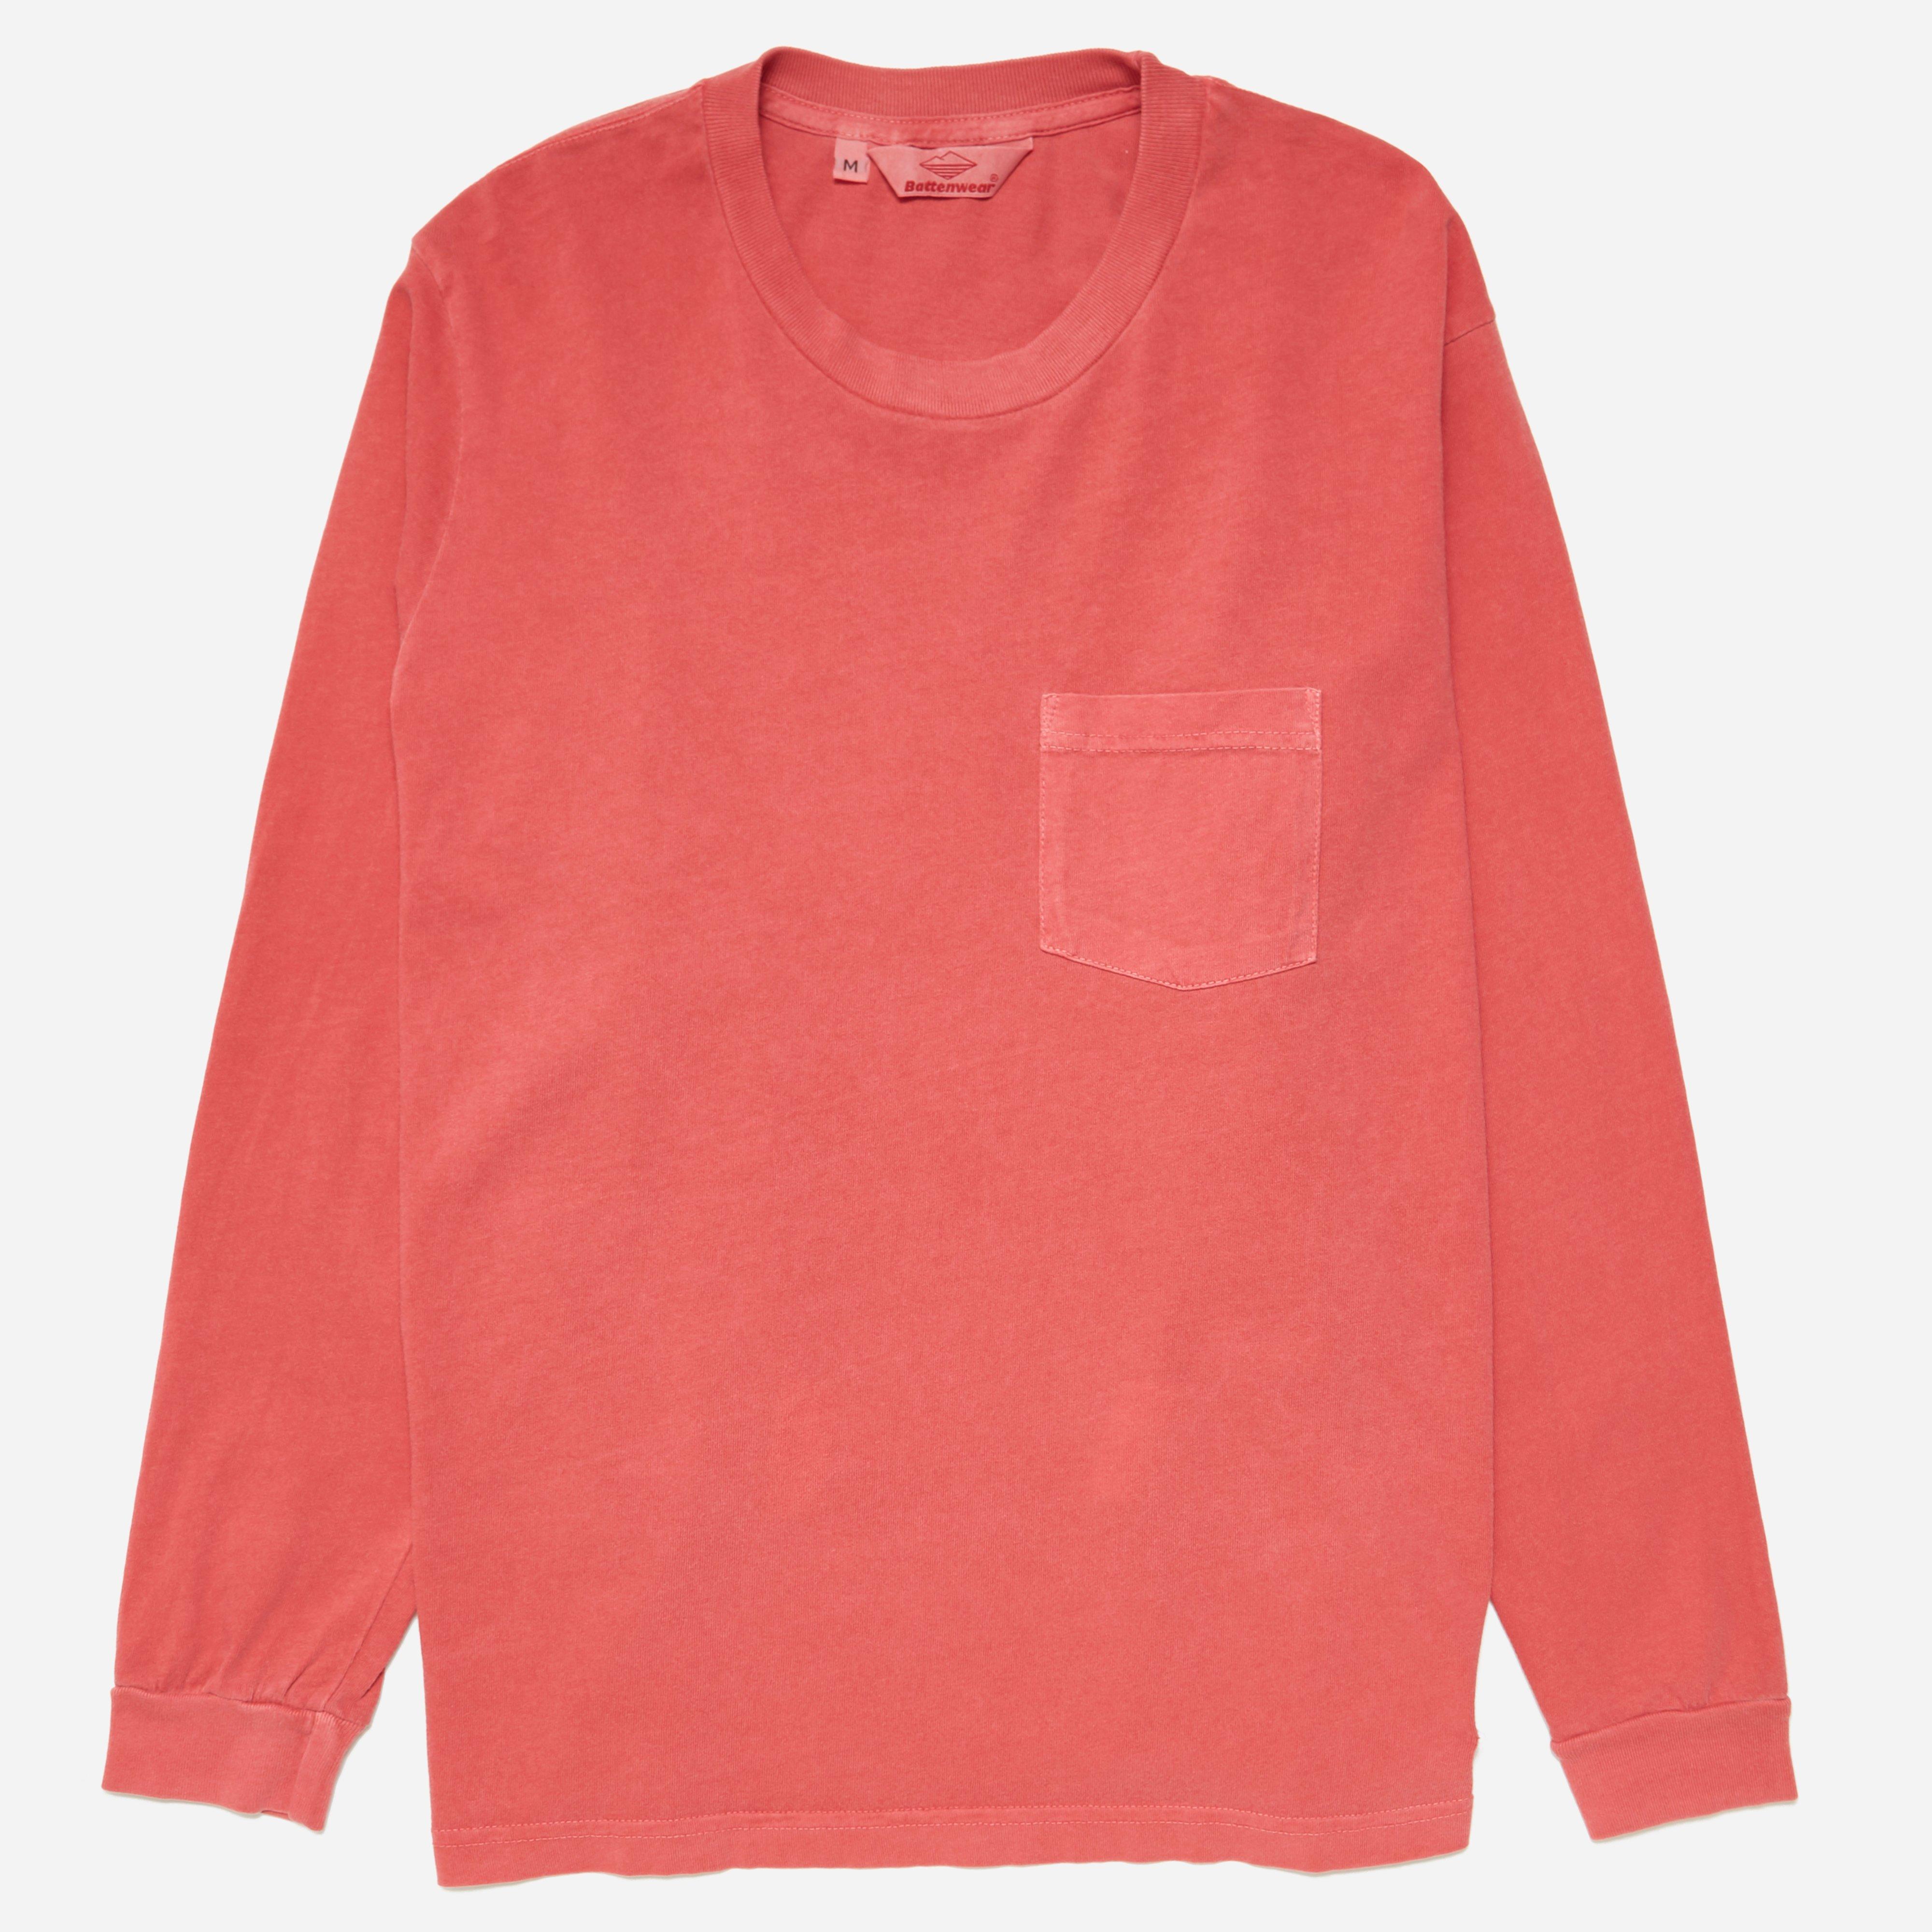 Battenwear Long Sleeve Pocket T-shirt